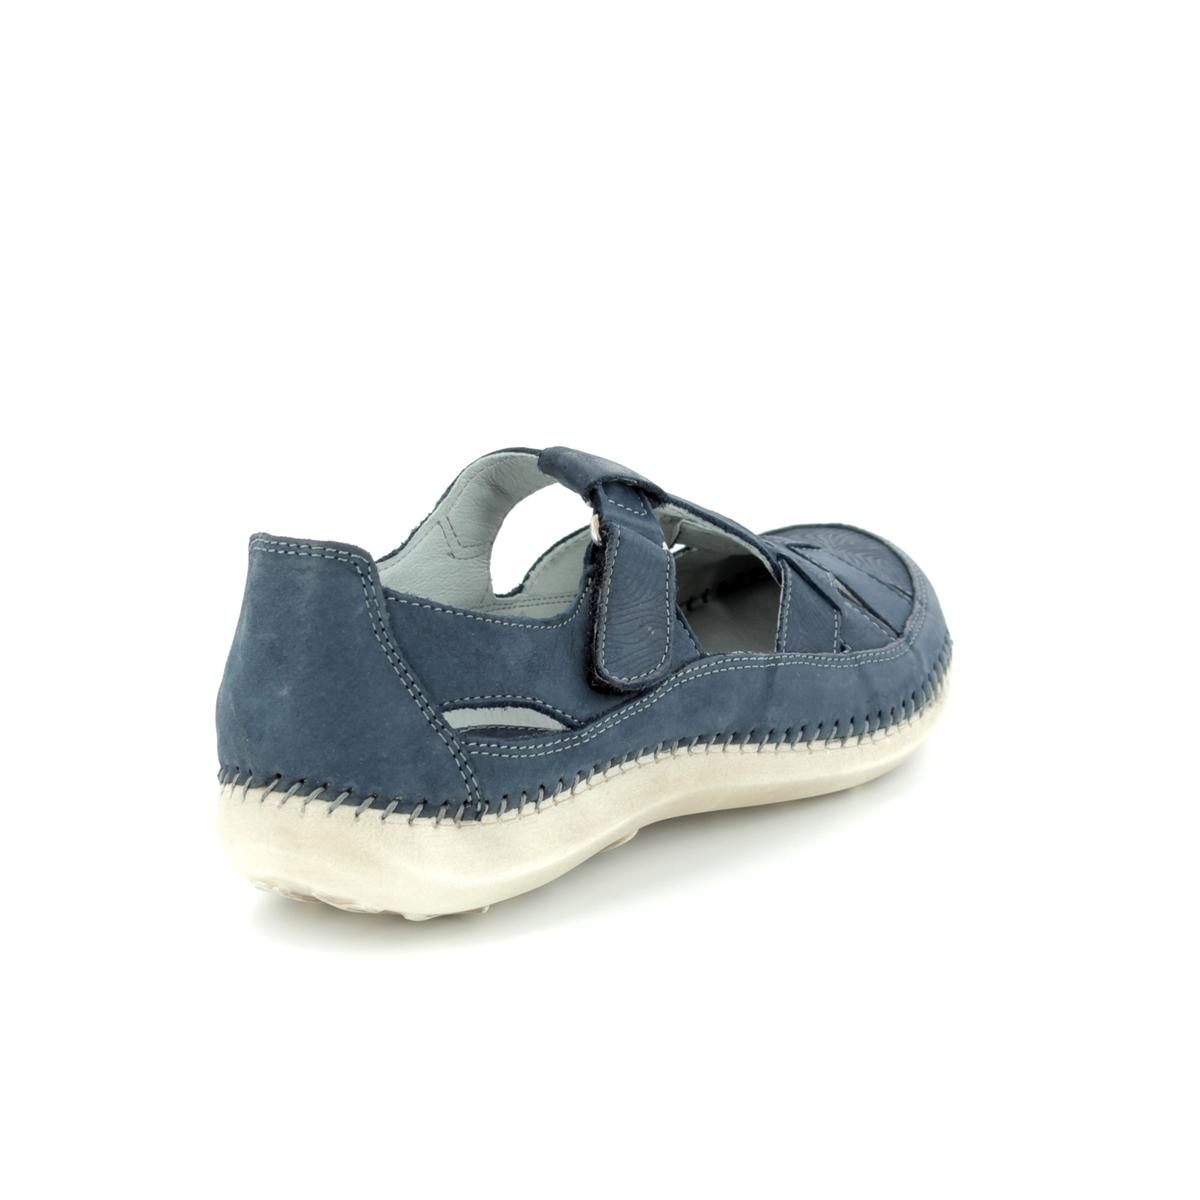 Daislat 7105-16030 Blue Comfort Slip